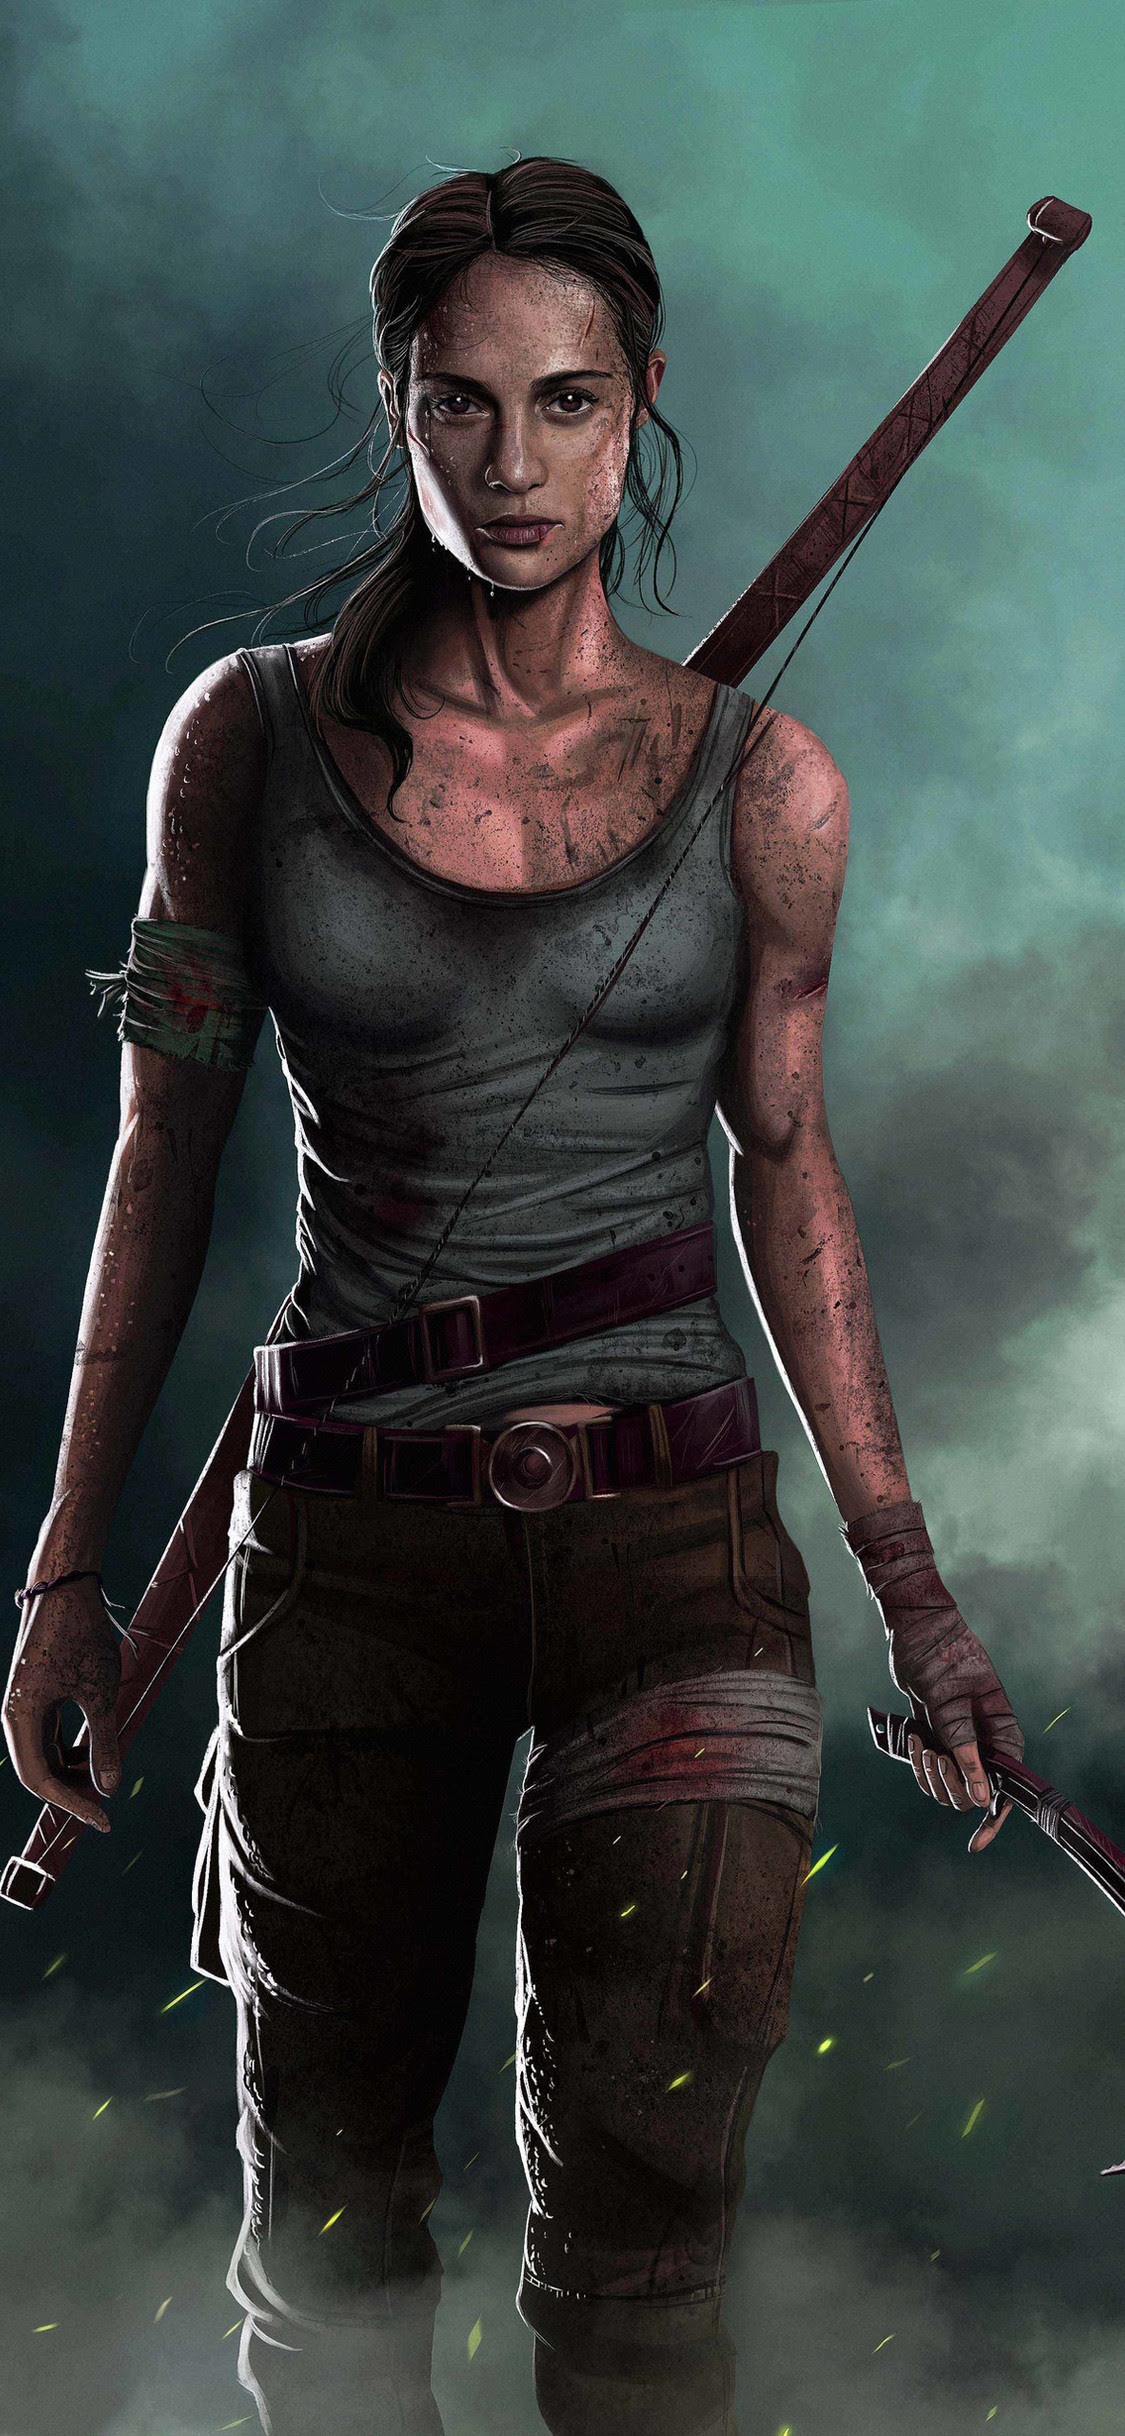 Tomb Raider iPhone Wallpaper (87+ images)